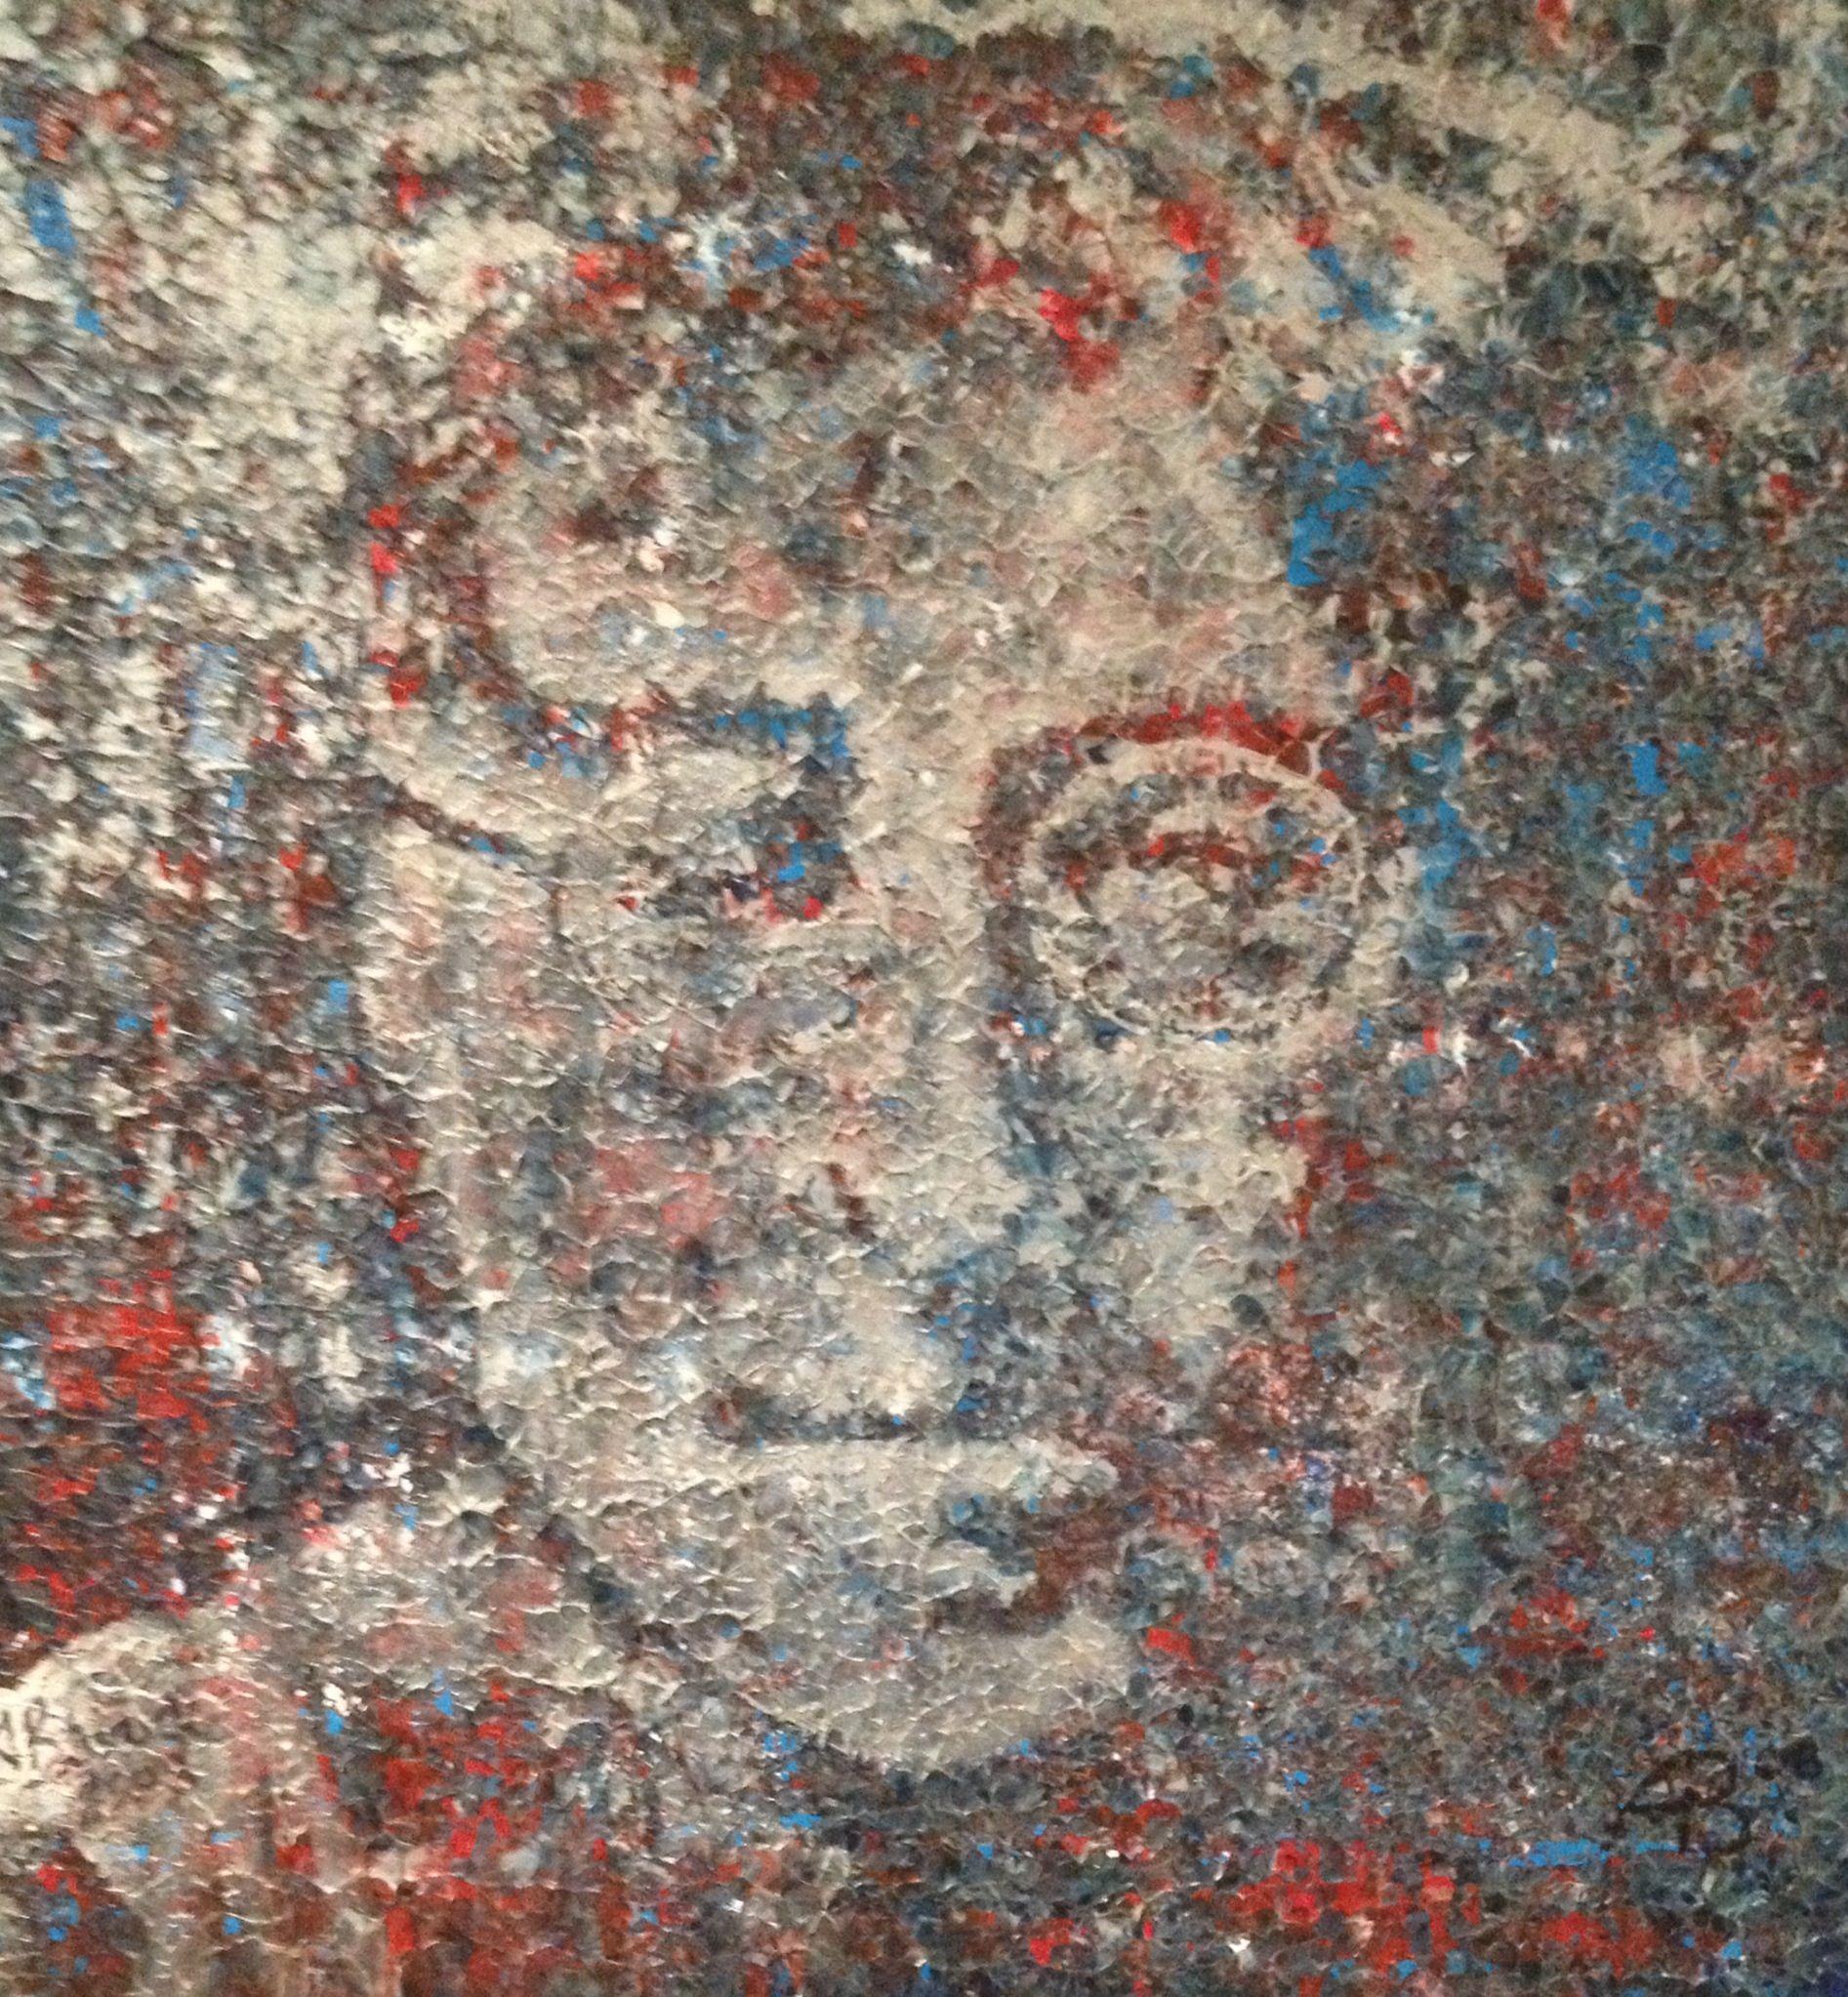 John Lennon fait par Alain Briard